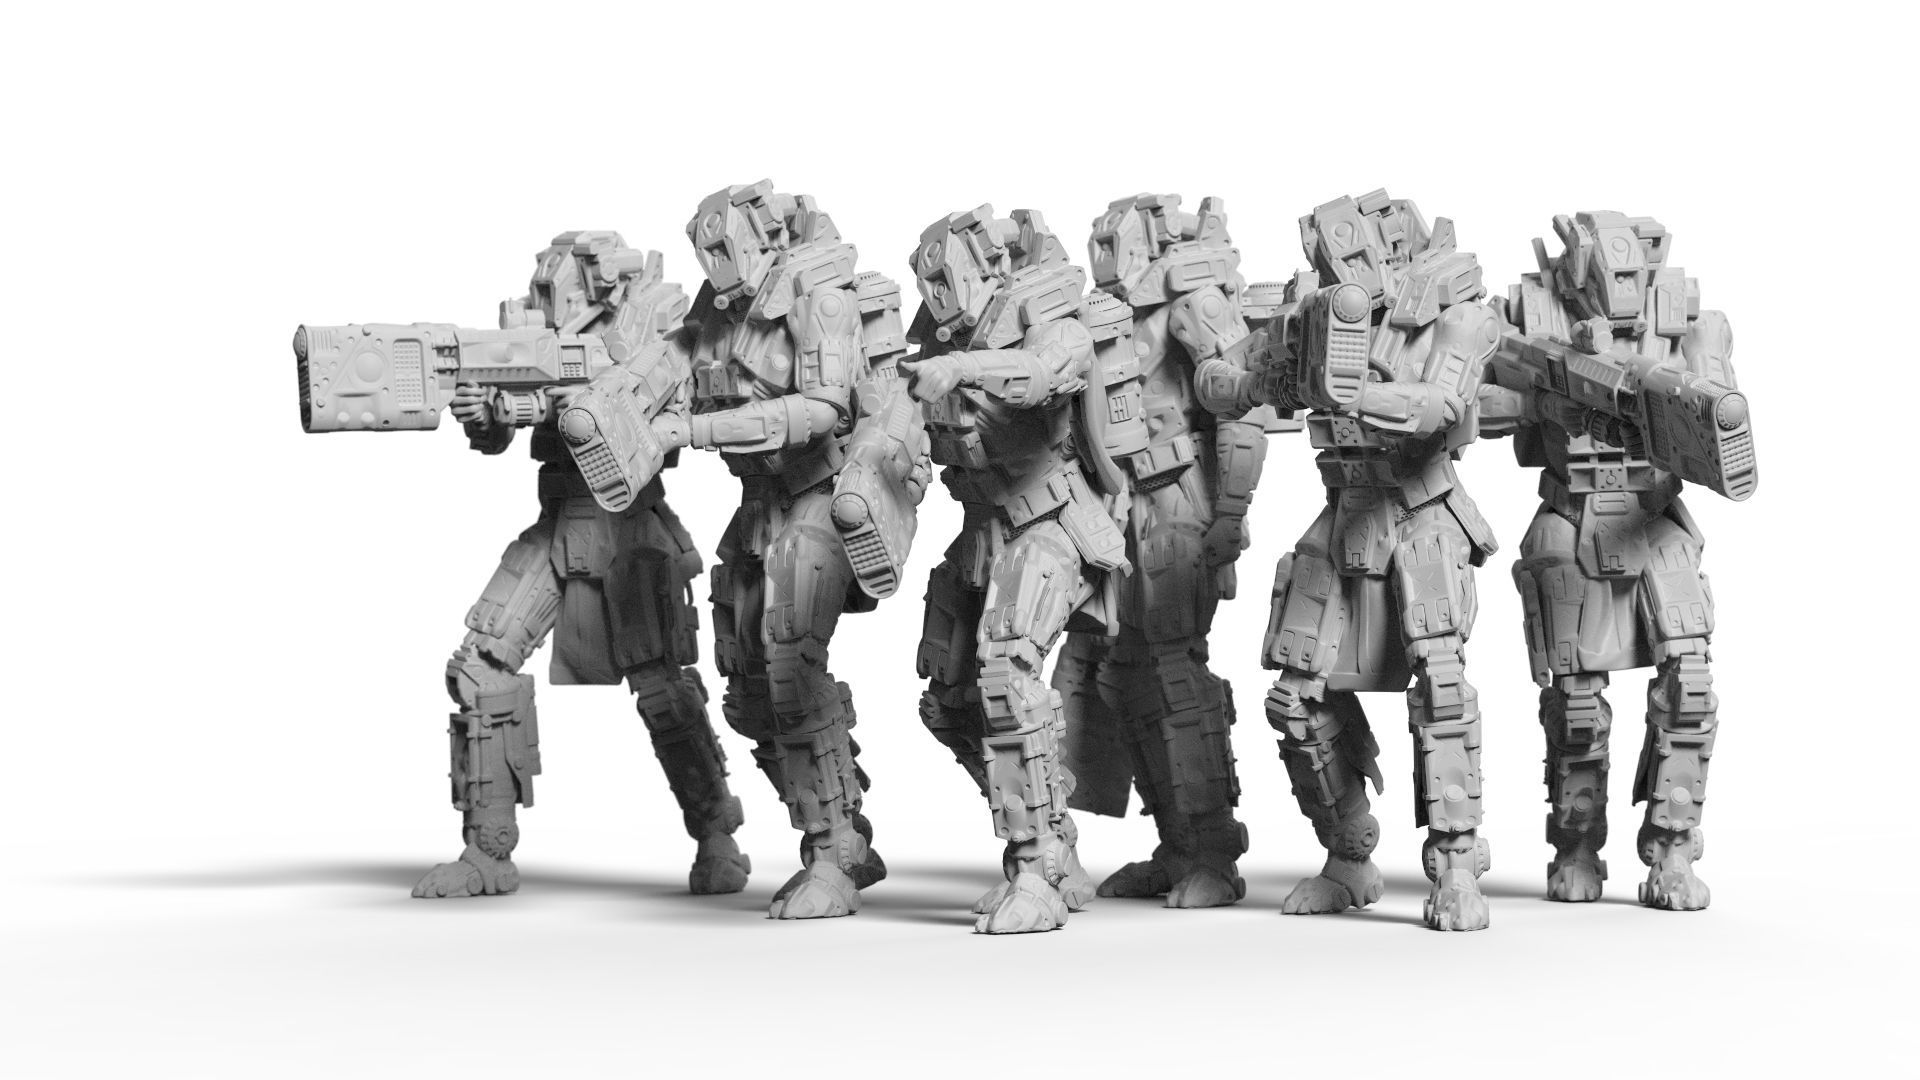 Sci Fi Battle Armor Miniatures - Energy Laser Rifle Team